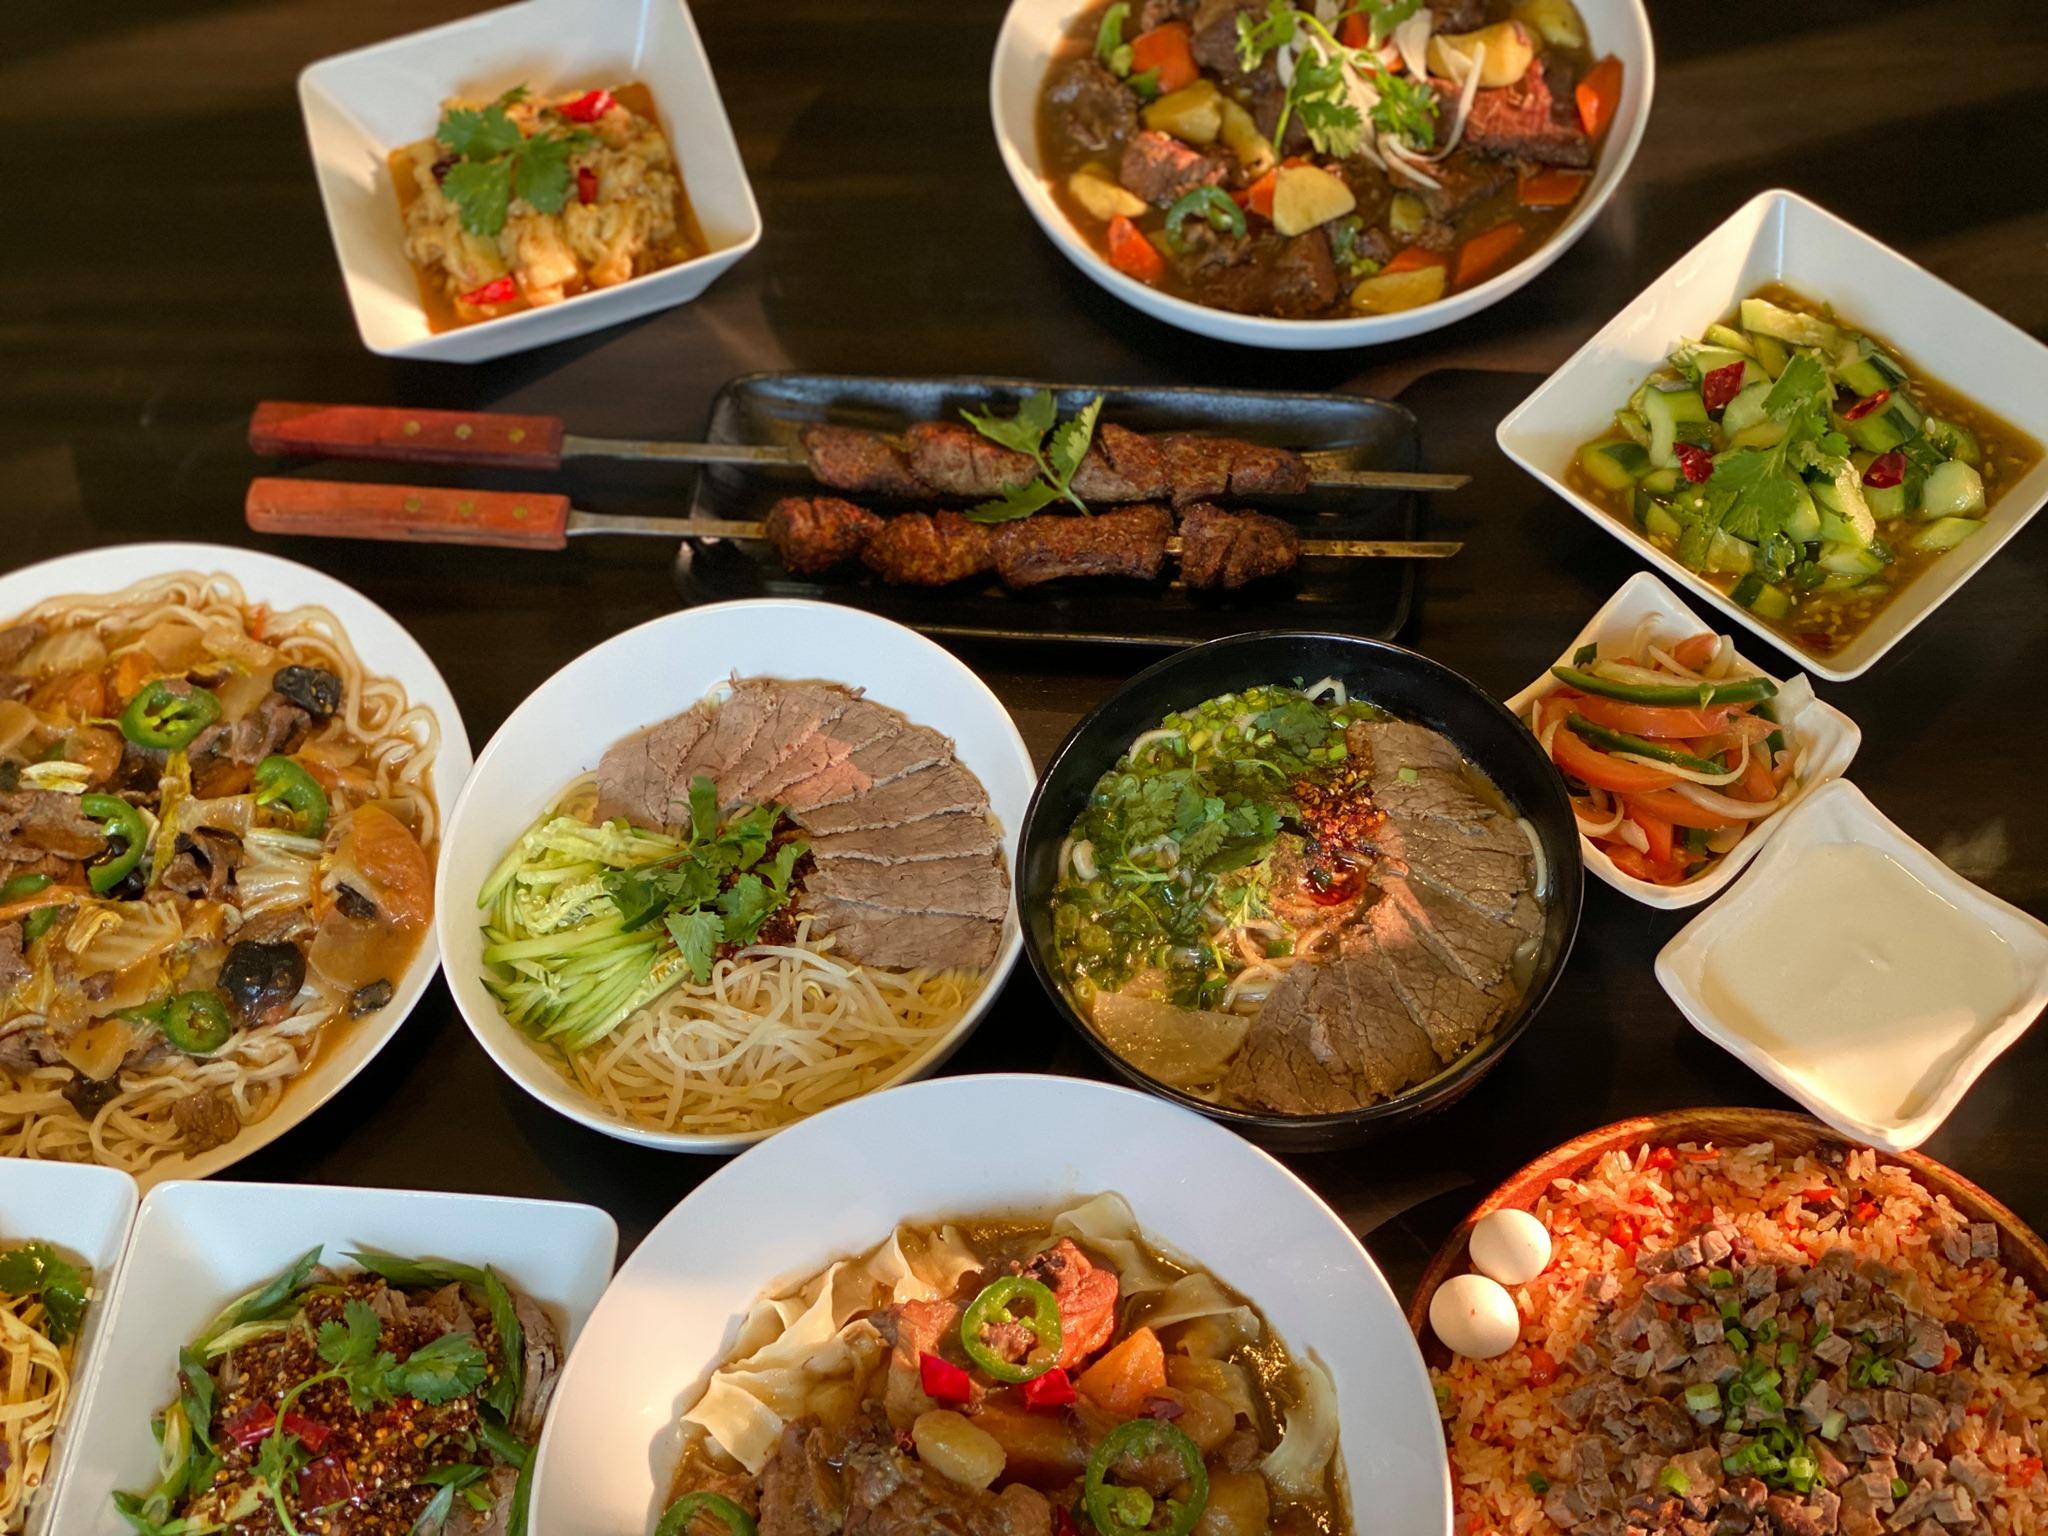 Kusan Uyghur Cuisine San Jose catering